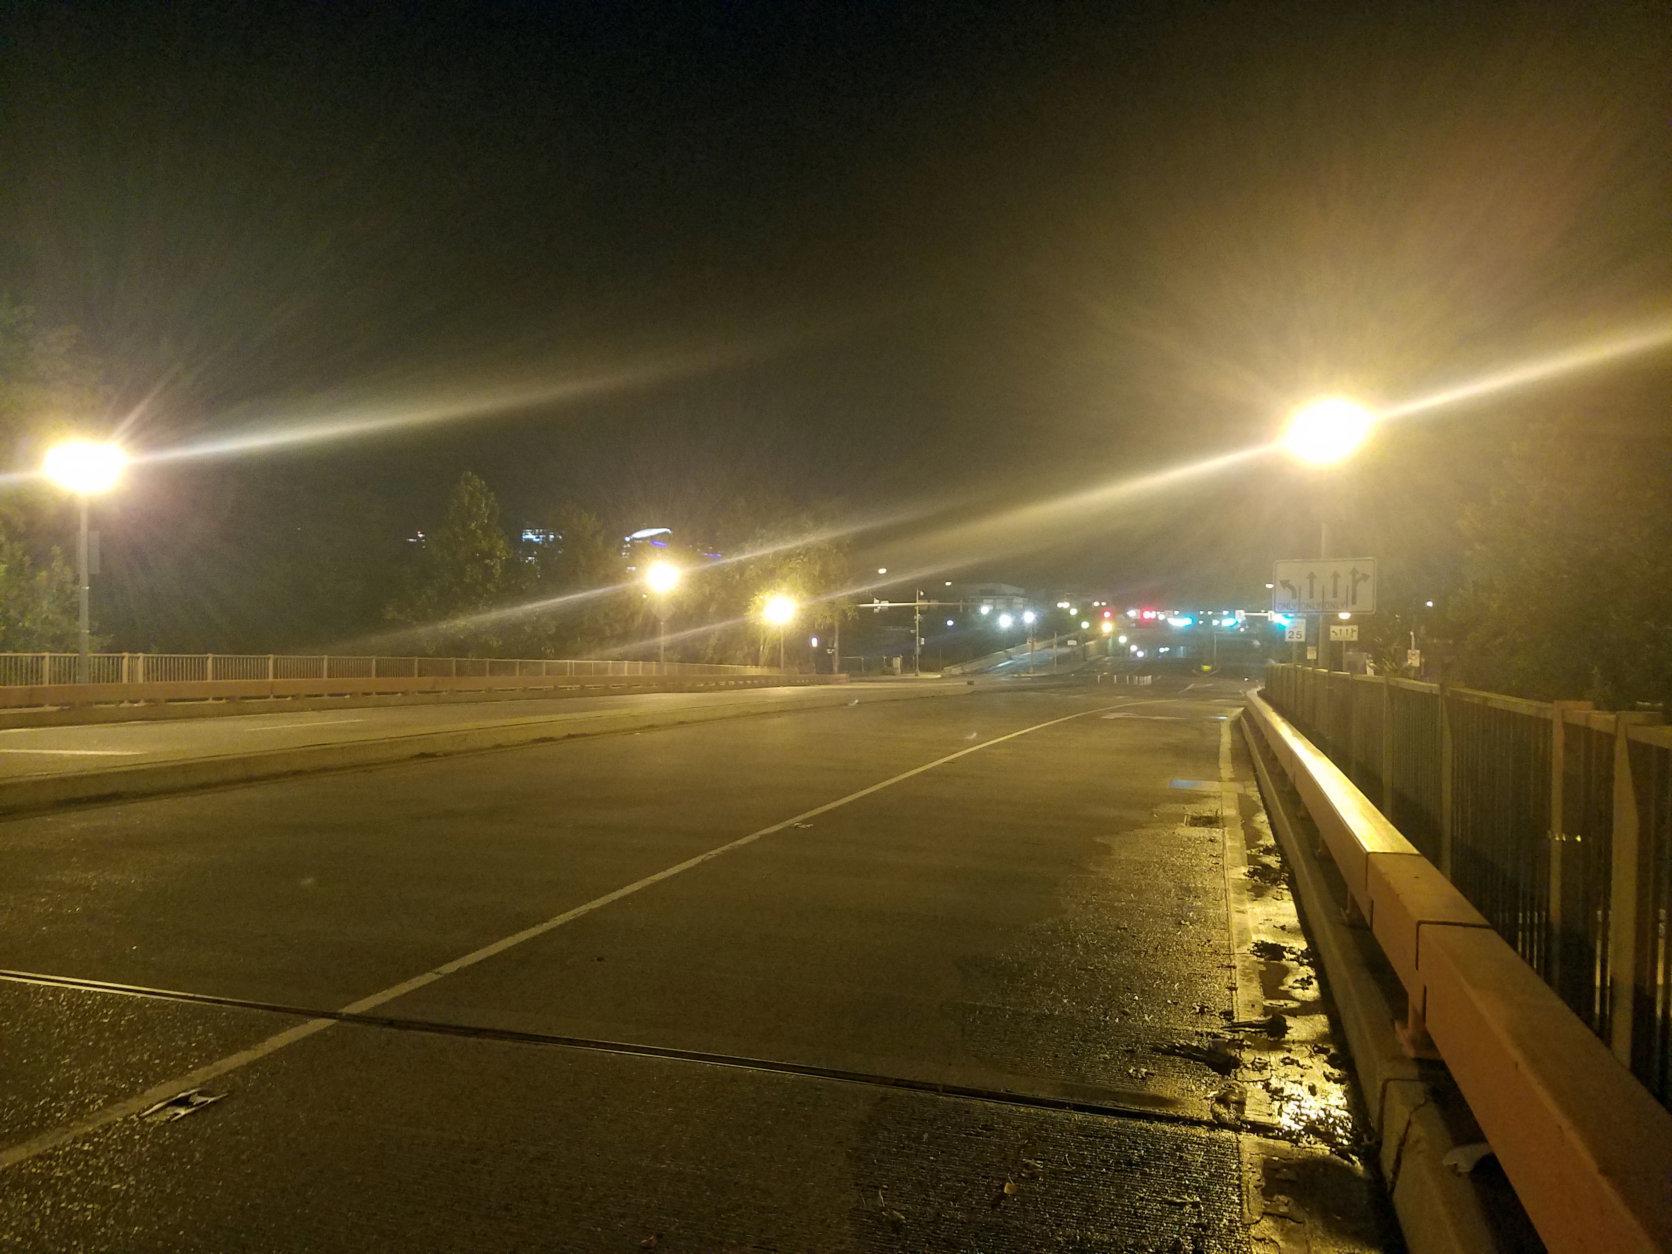 A headless man is said to appear on the K Street Bridge on starless nights. (WTOP/Will Vitka)